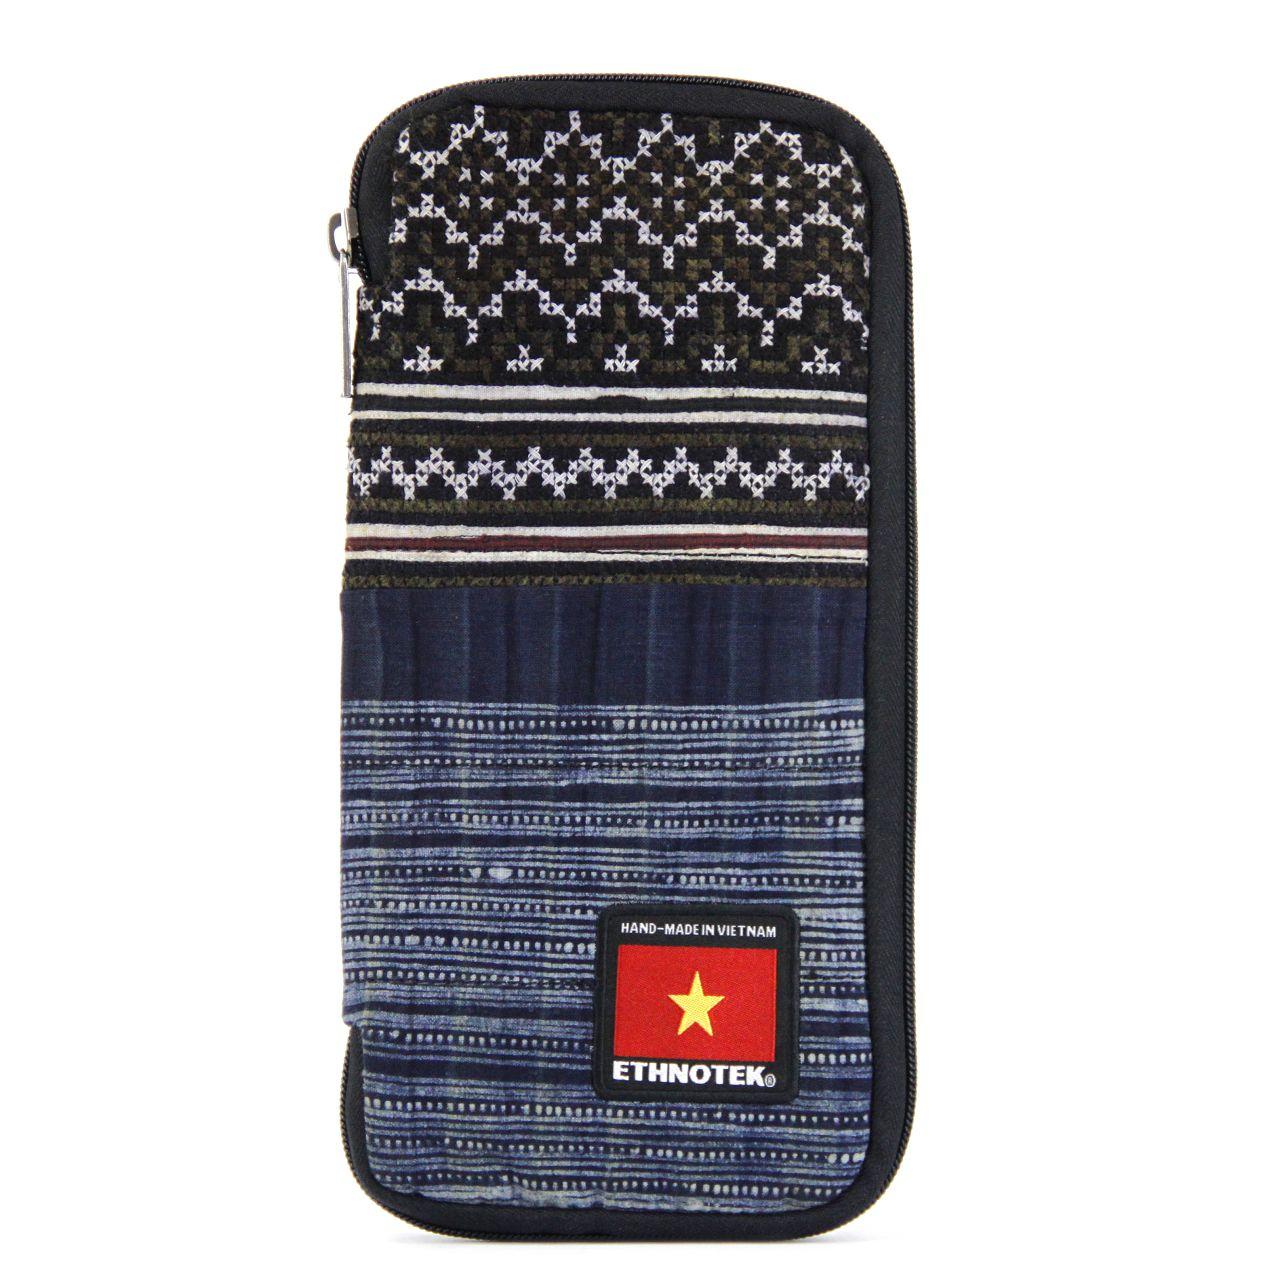 0cc3ff6a7210 The Chiburi Travel Organizer Wallet   Accessoires The Chiburi Travel ...